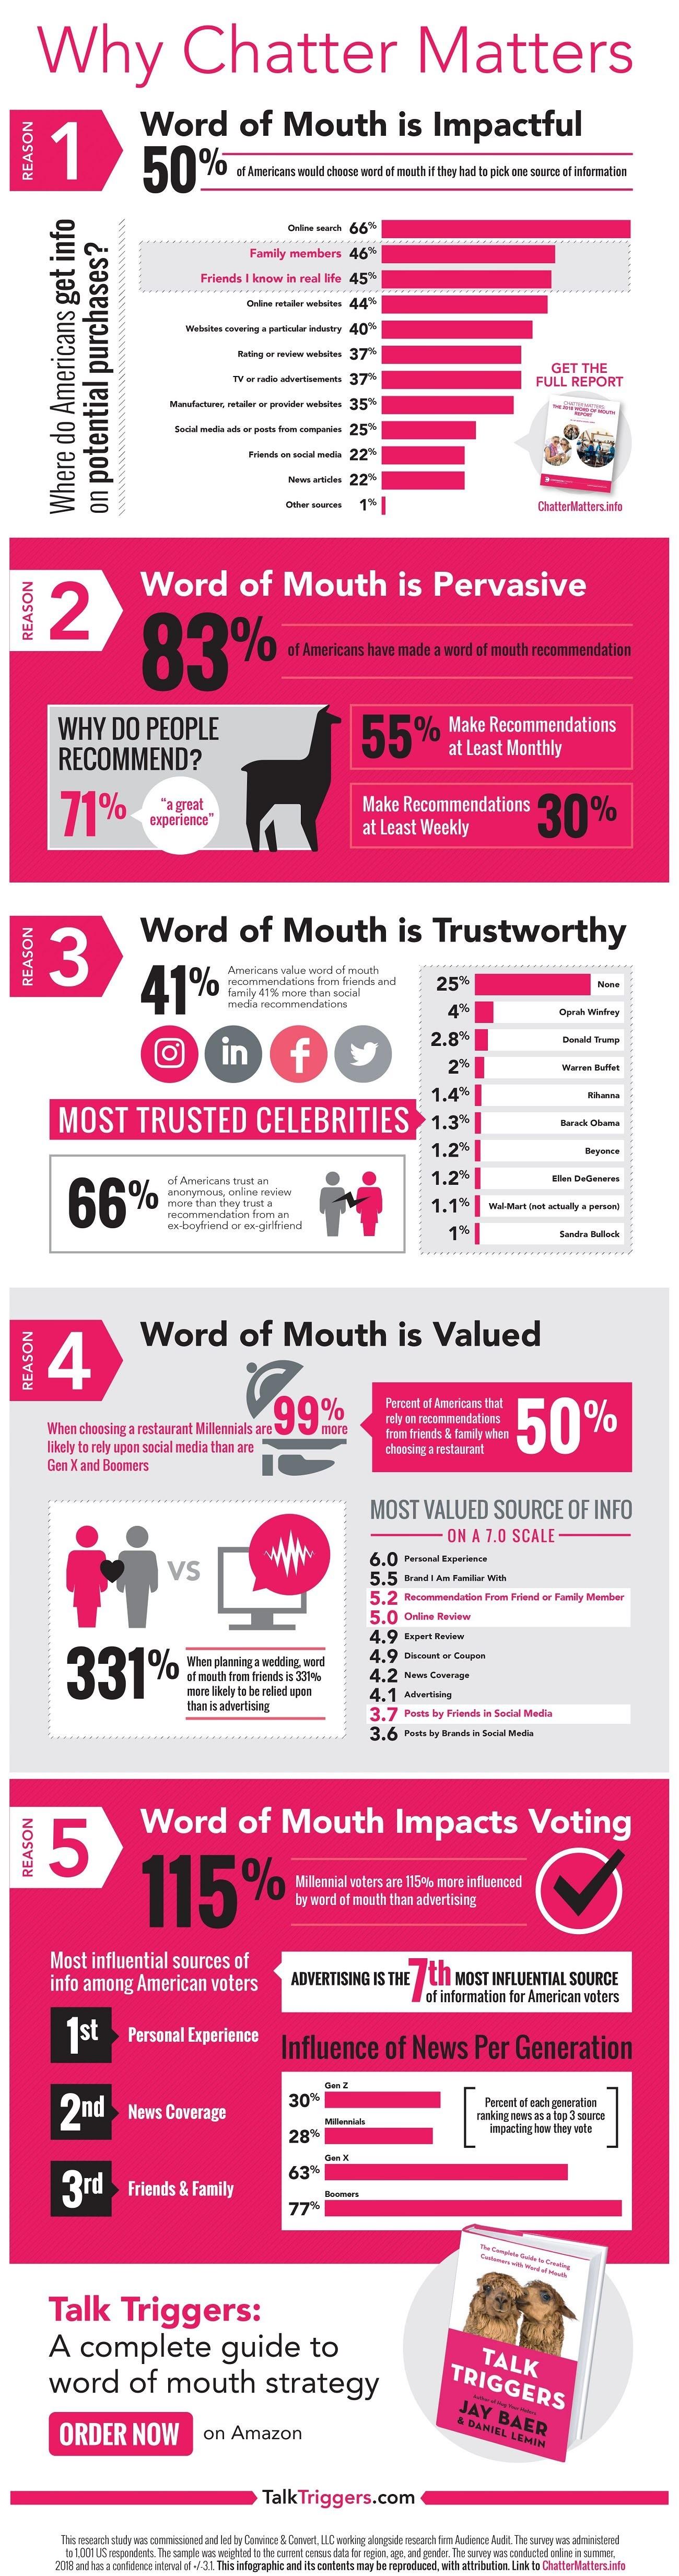 Chatter Matters info